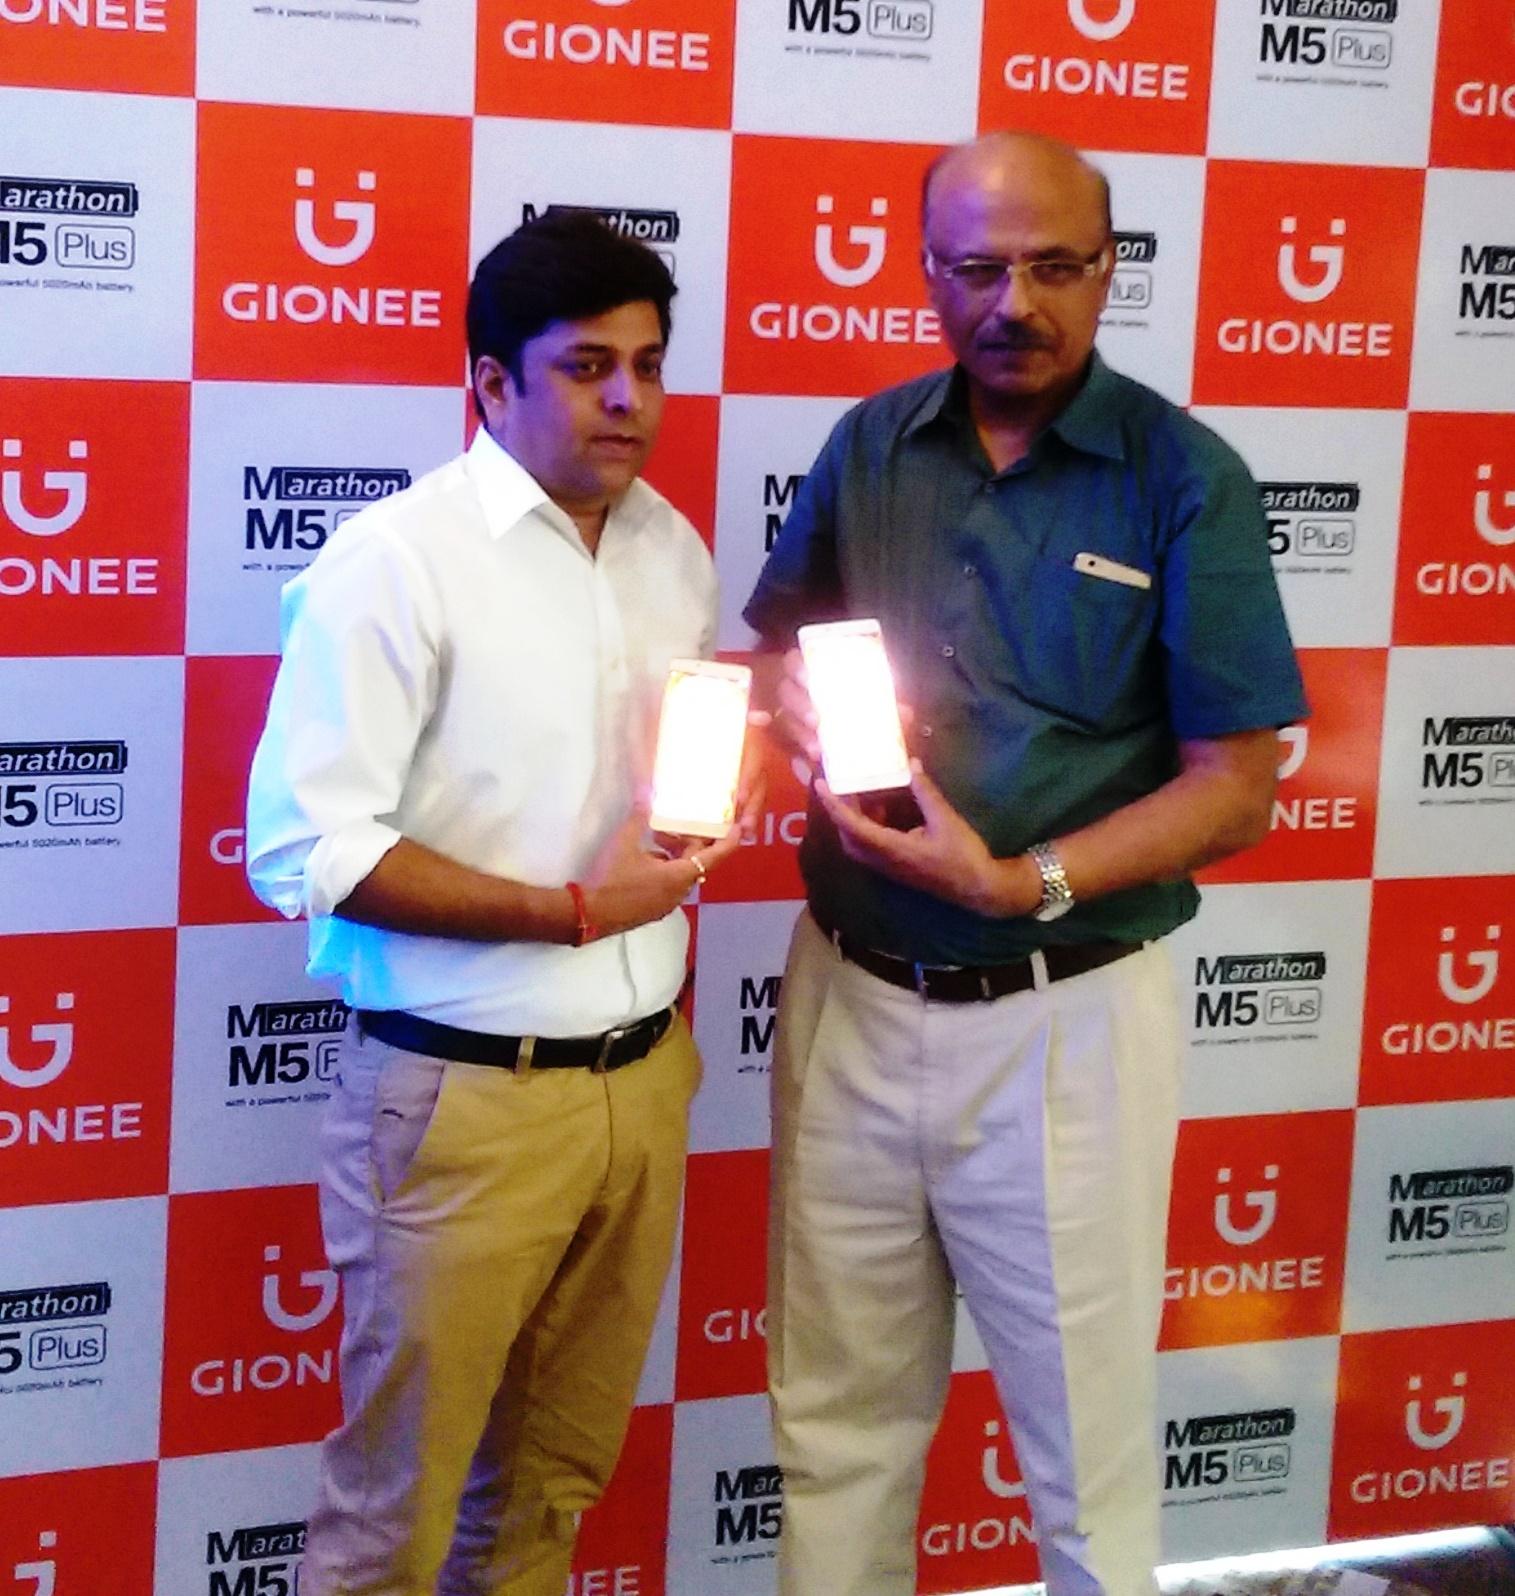 (L-R)-Mr. Alok Srivastava_Regional Director_North with Anil Sharma, Head Distributor, Punjab and Mr.Anil Sharma Pic1